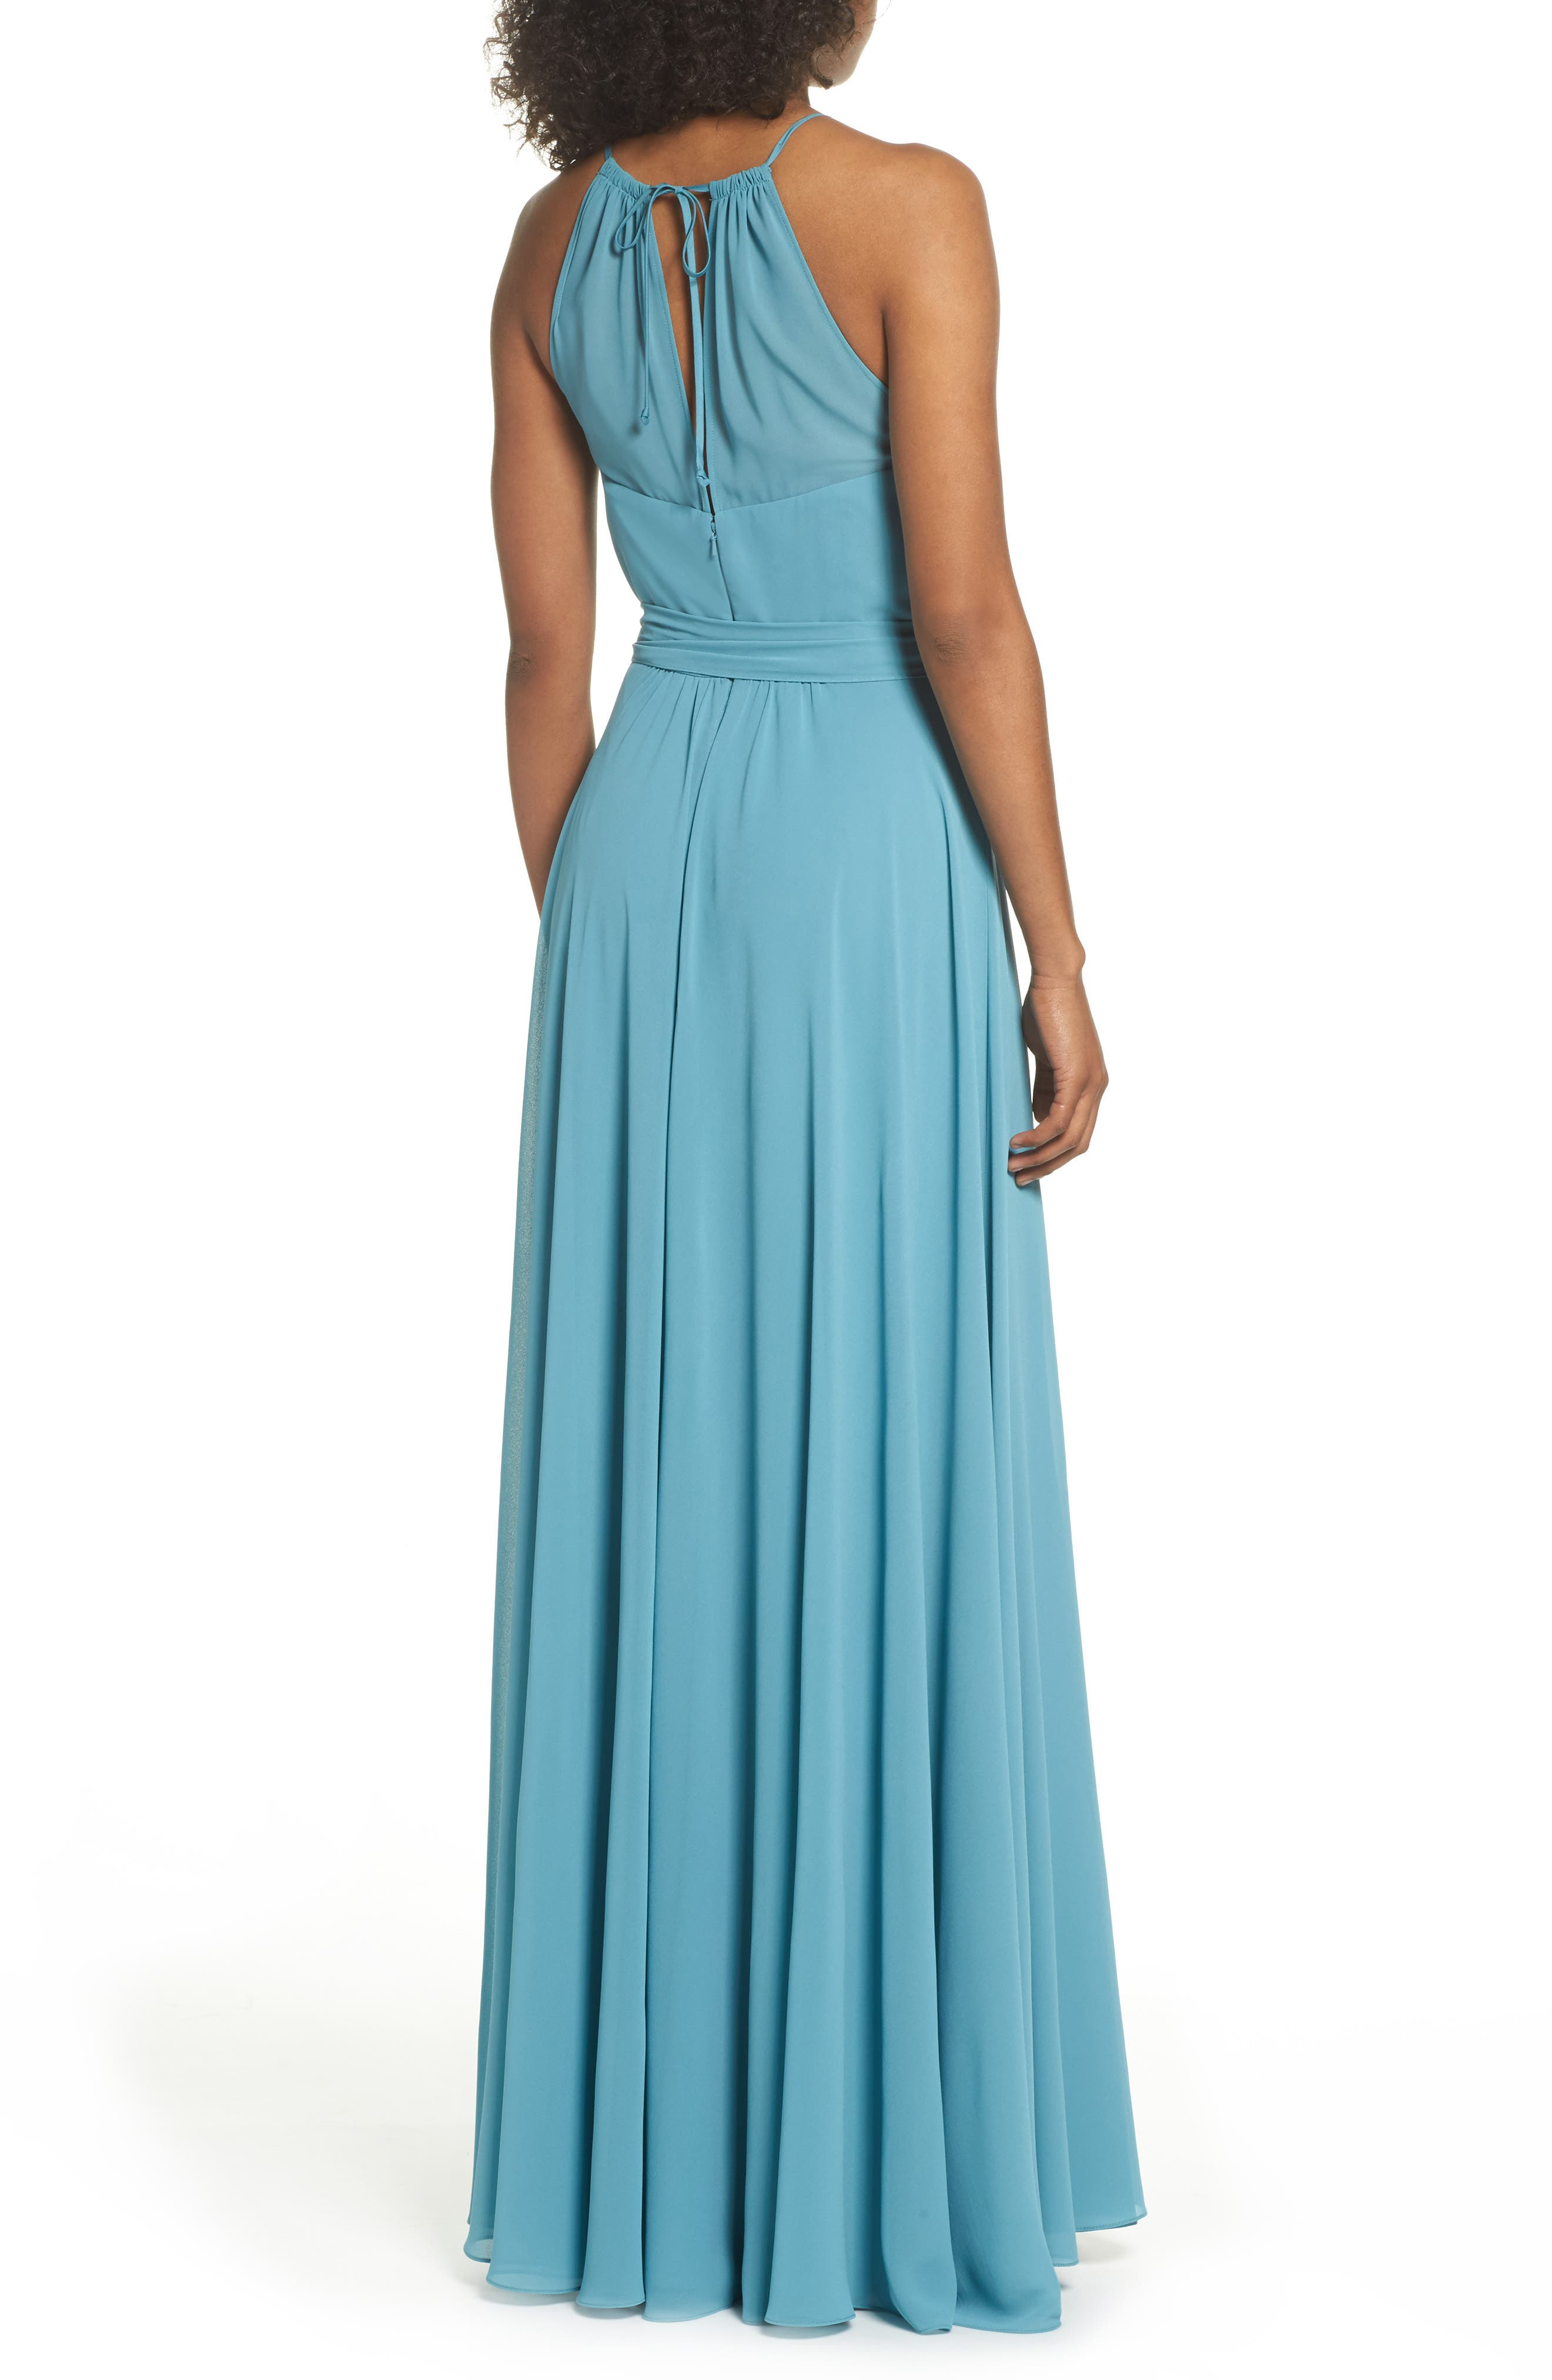 Blue Amsale Bridesmaid Dresses | Nordstrom